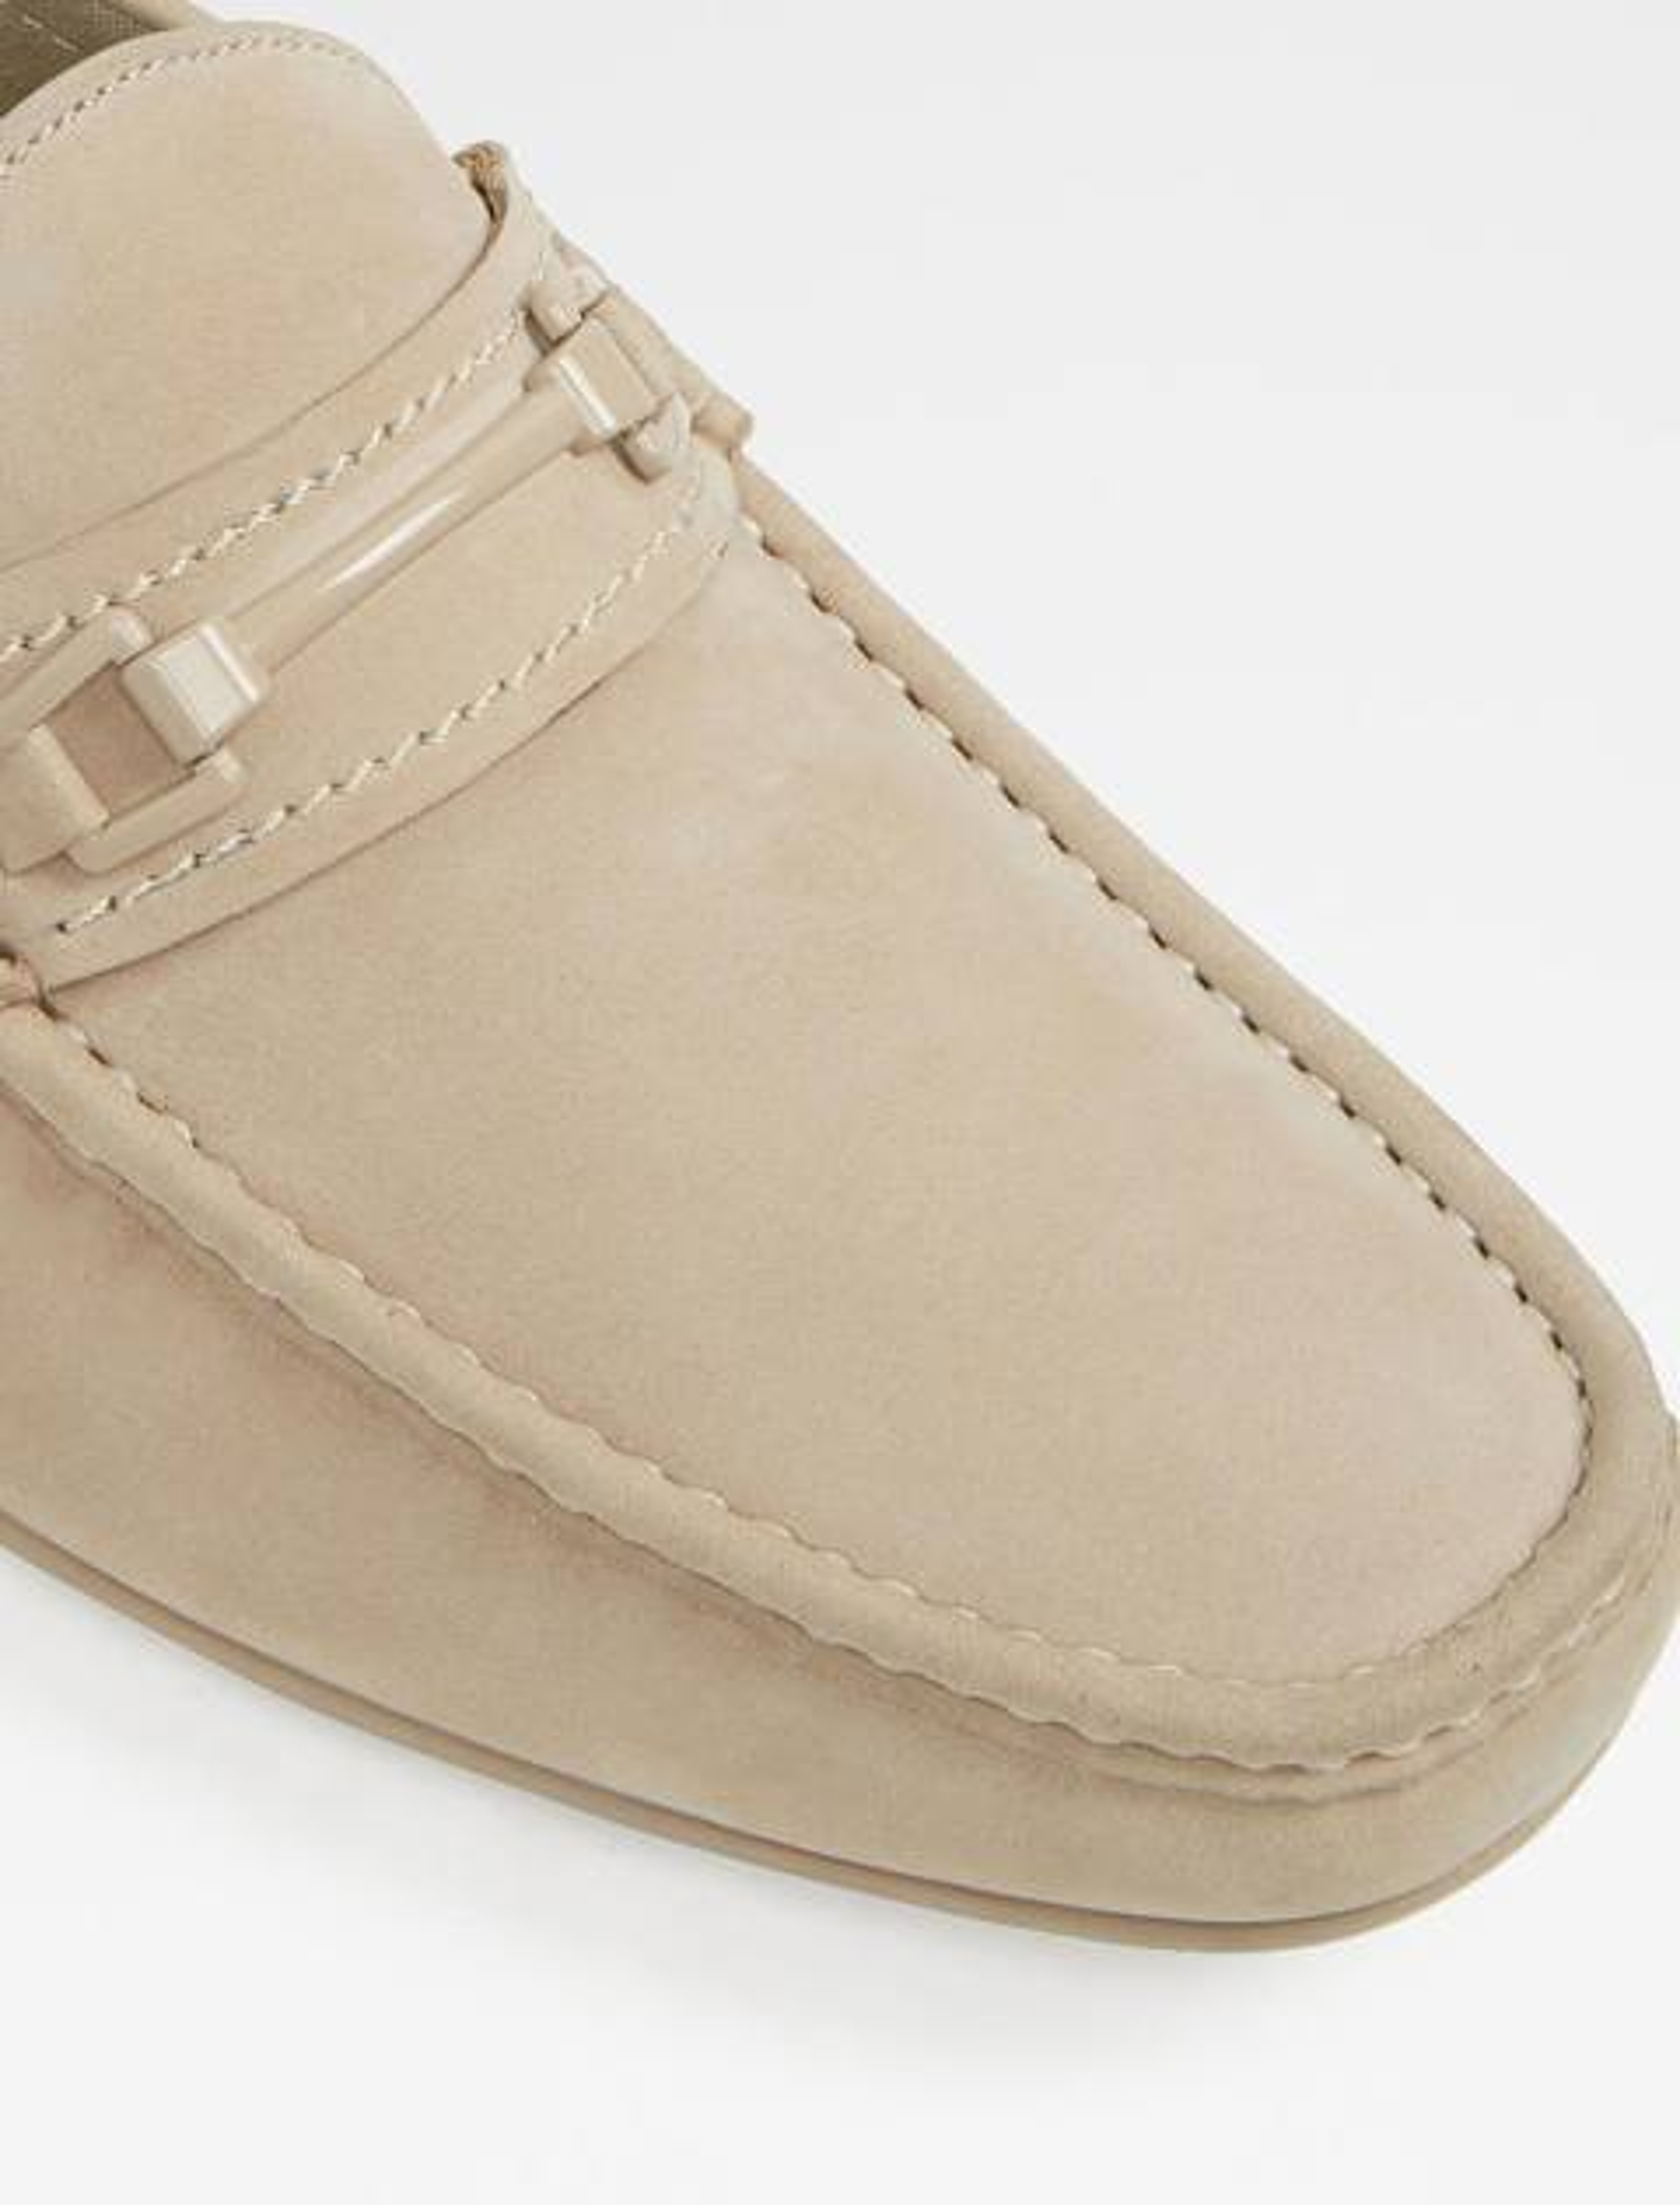 کفش چرم راحتی یکسره مردانه - کرم - 3